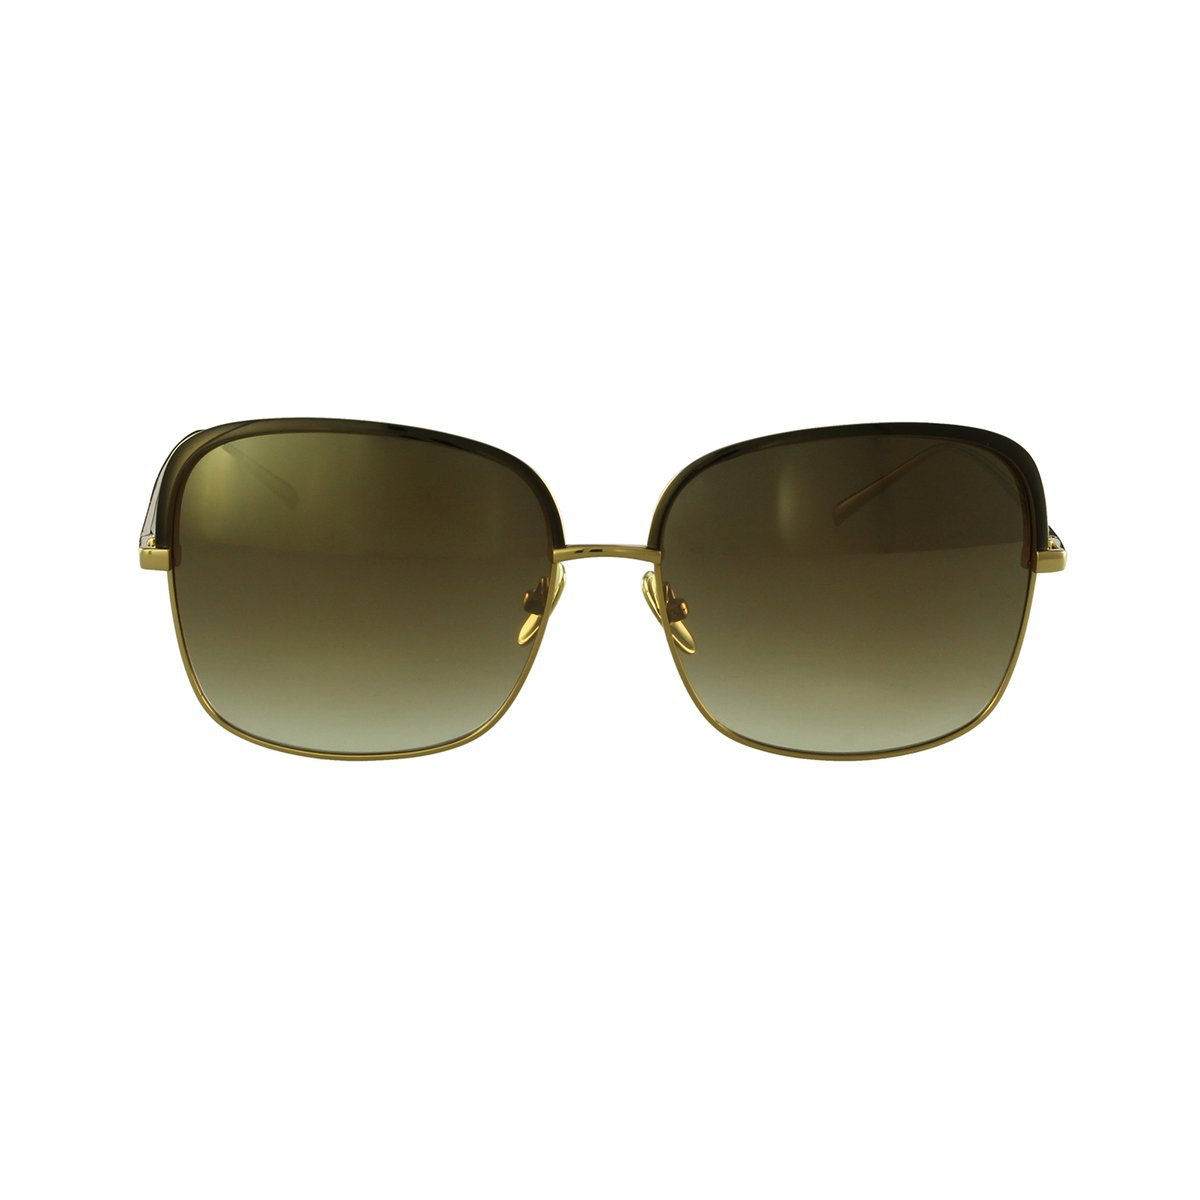 Óculos De Sol Ana Hickmann Casual - Compre Agora   Netshoes 5b541492a2